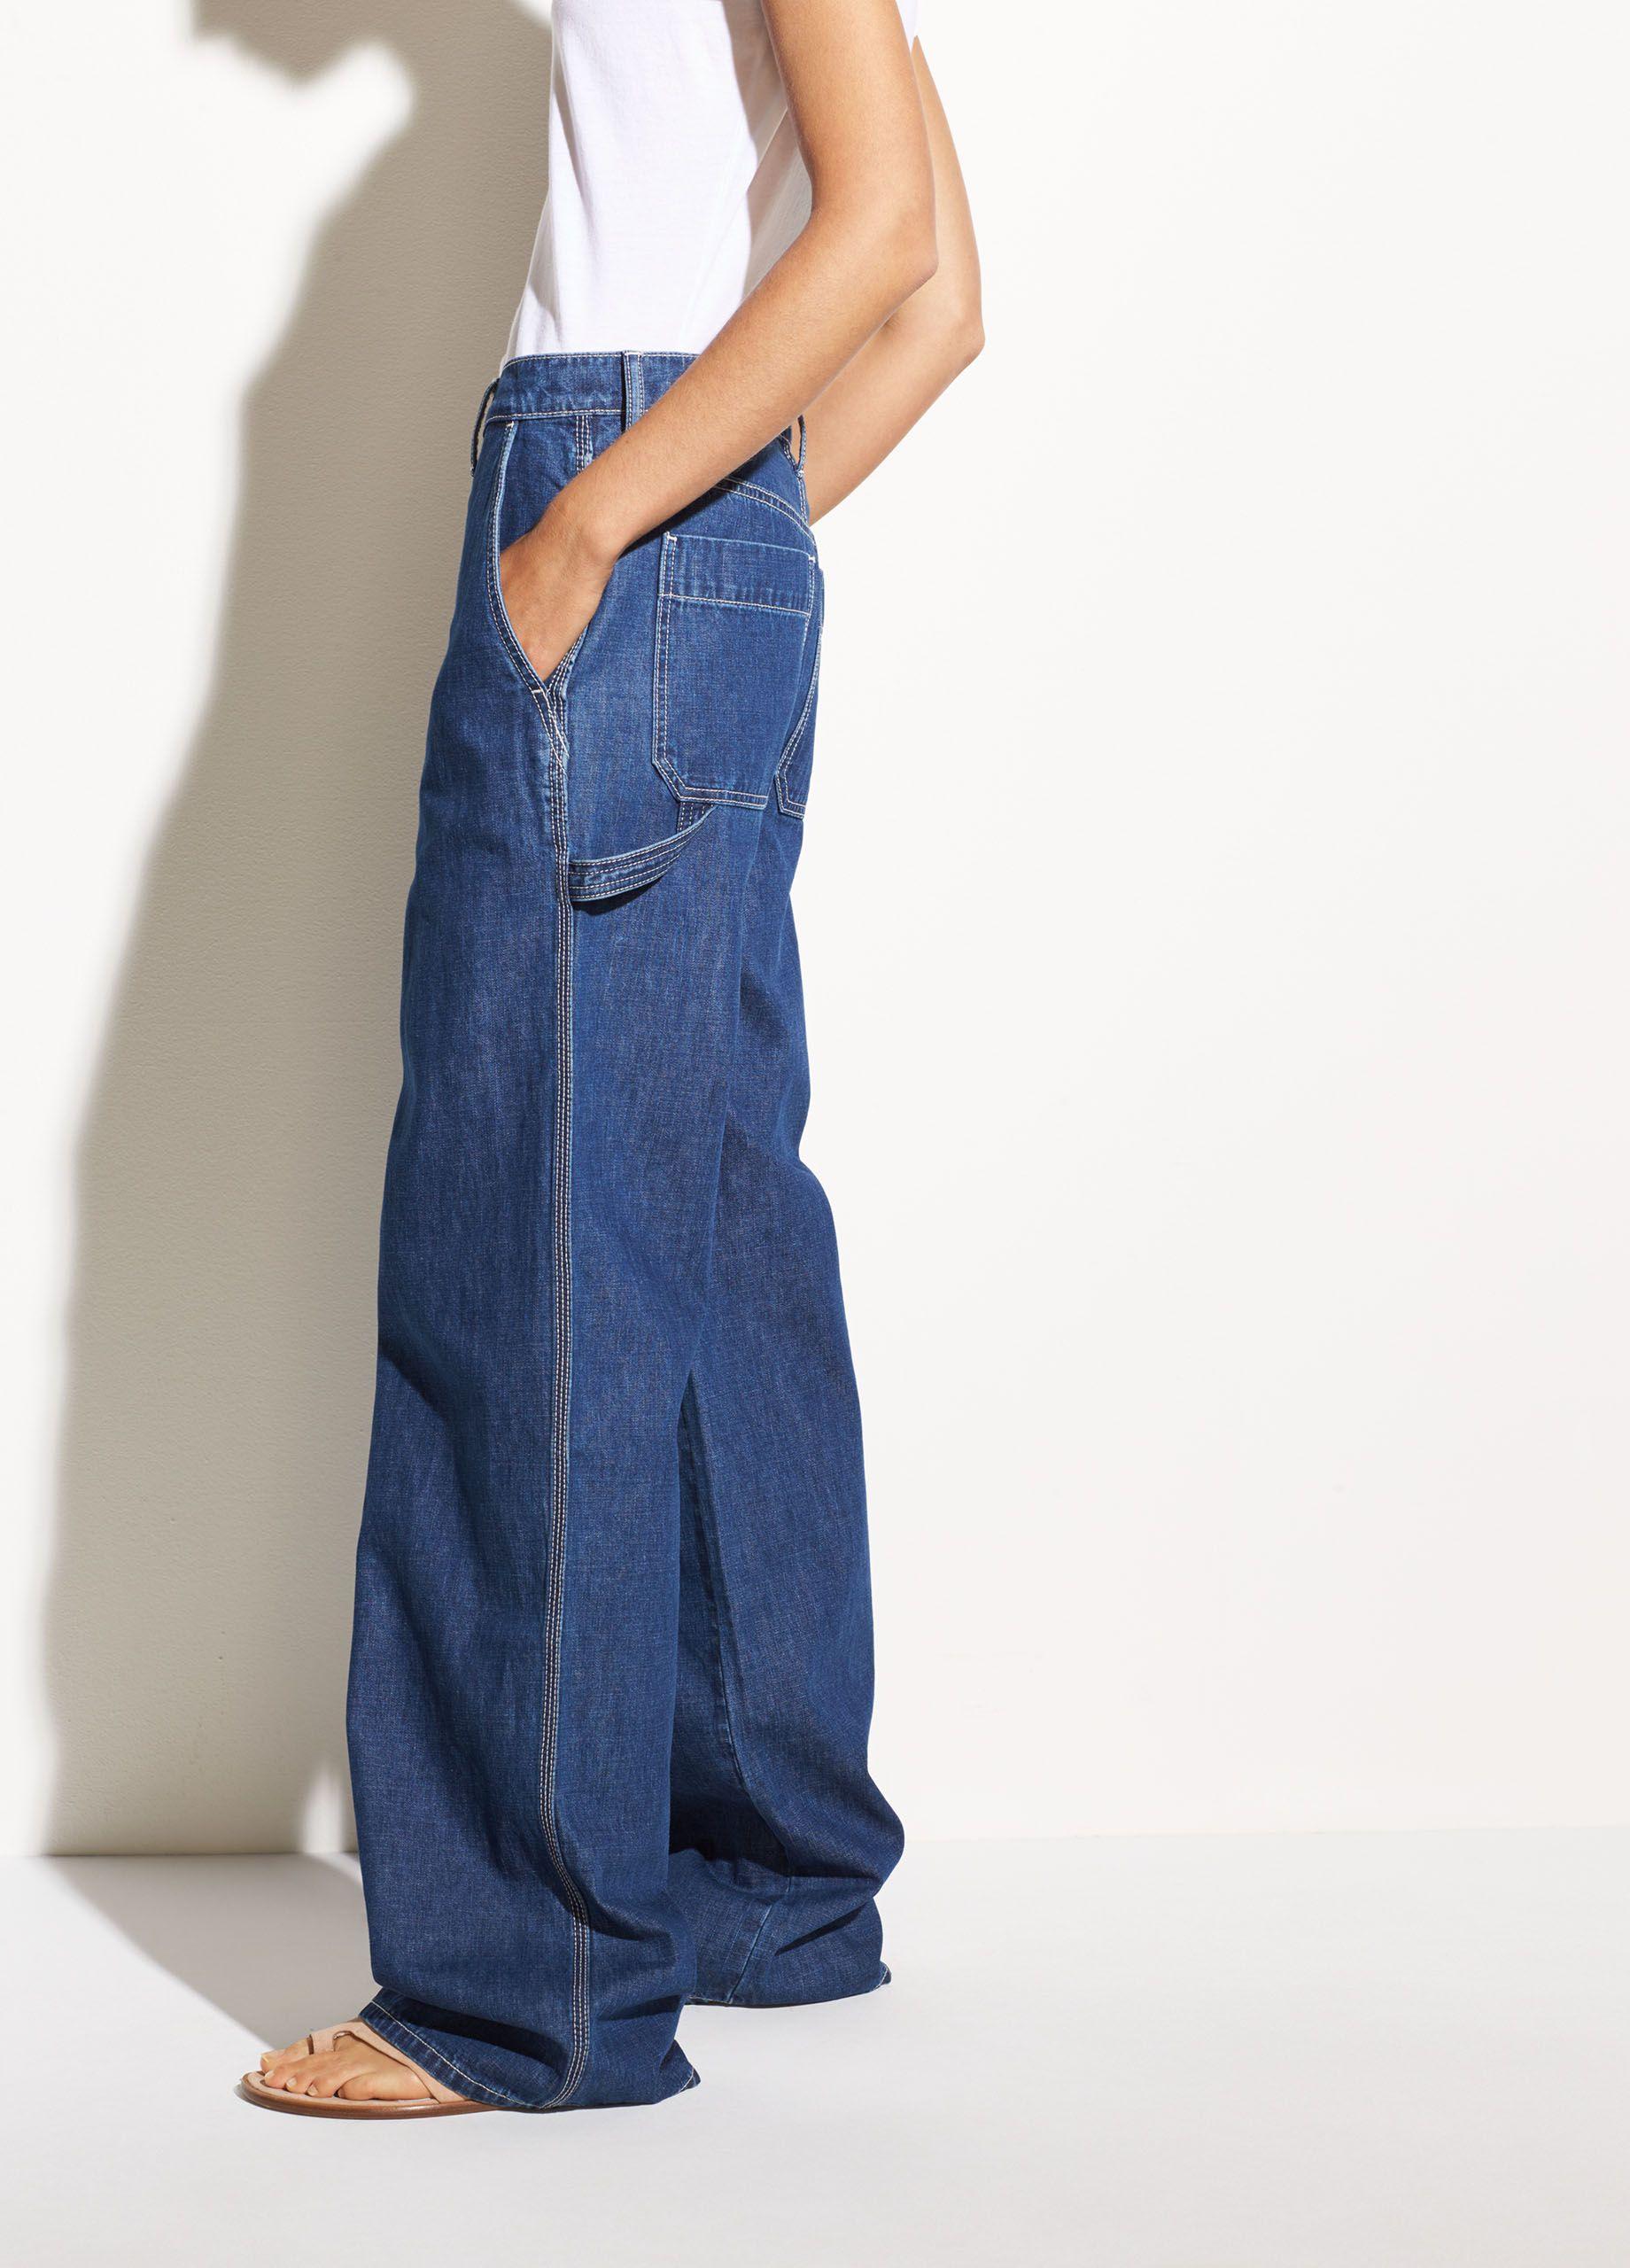 Sites Vince Site Vince Designer Jeans For Women Pants For